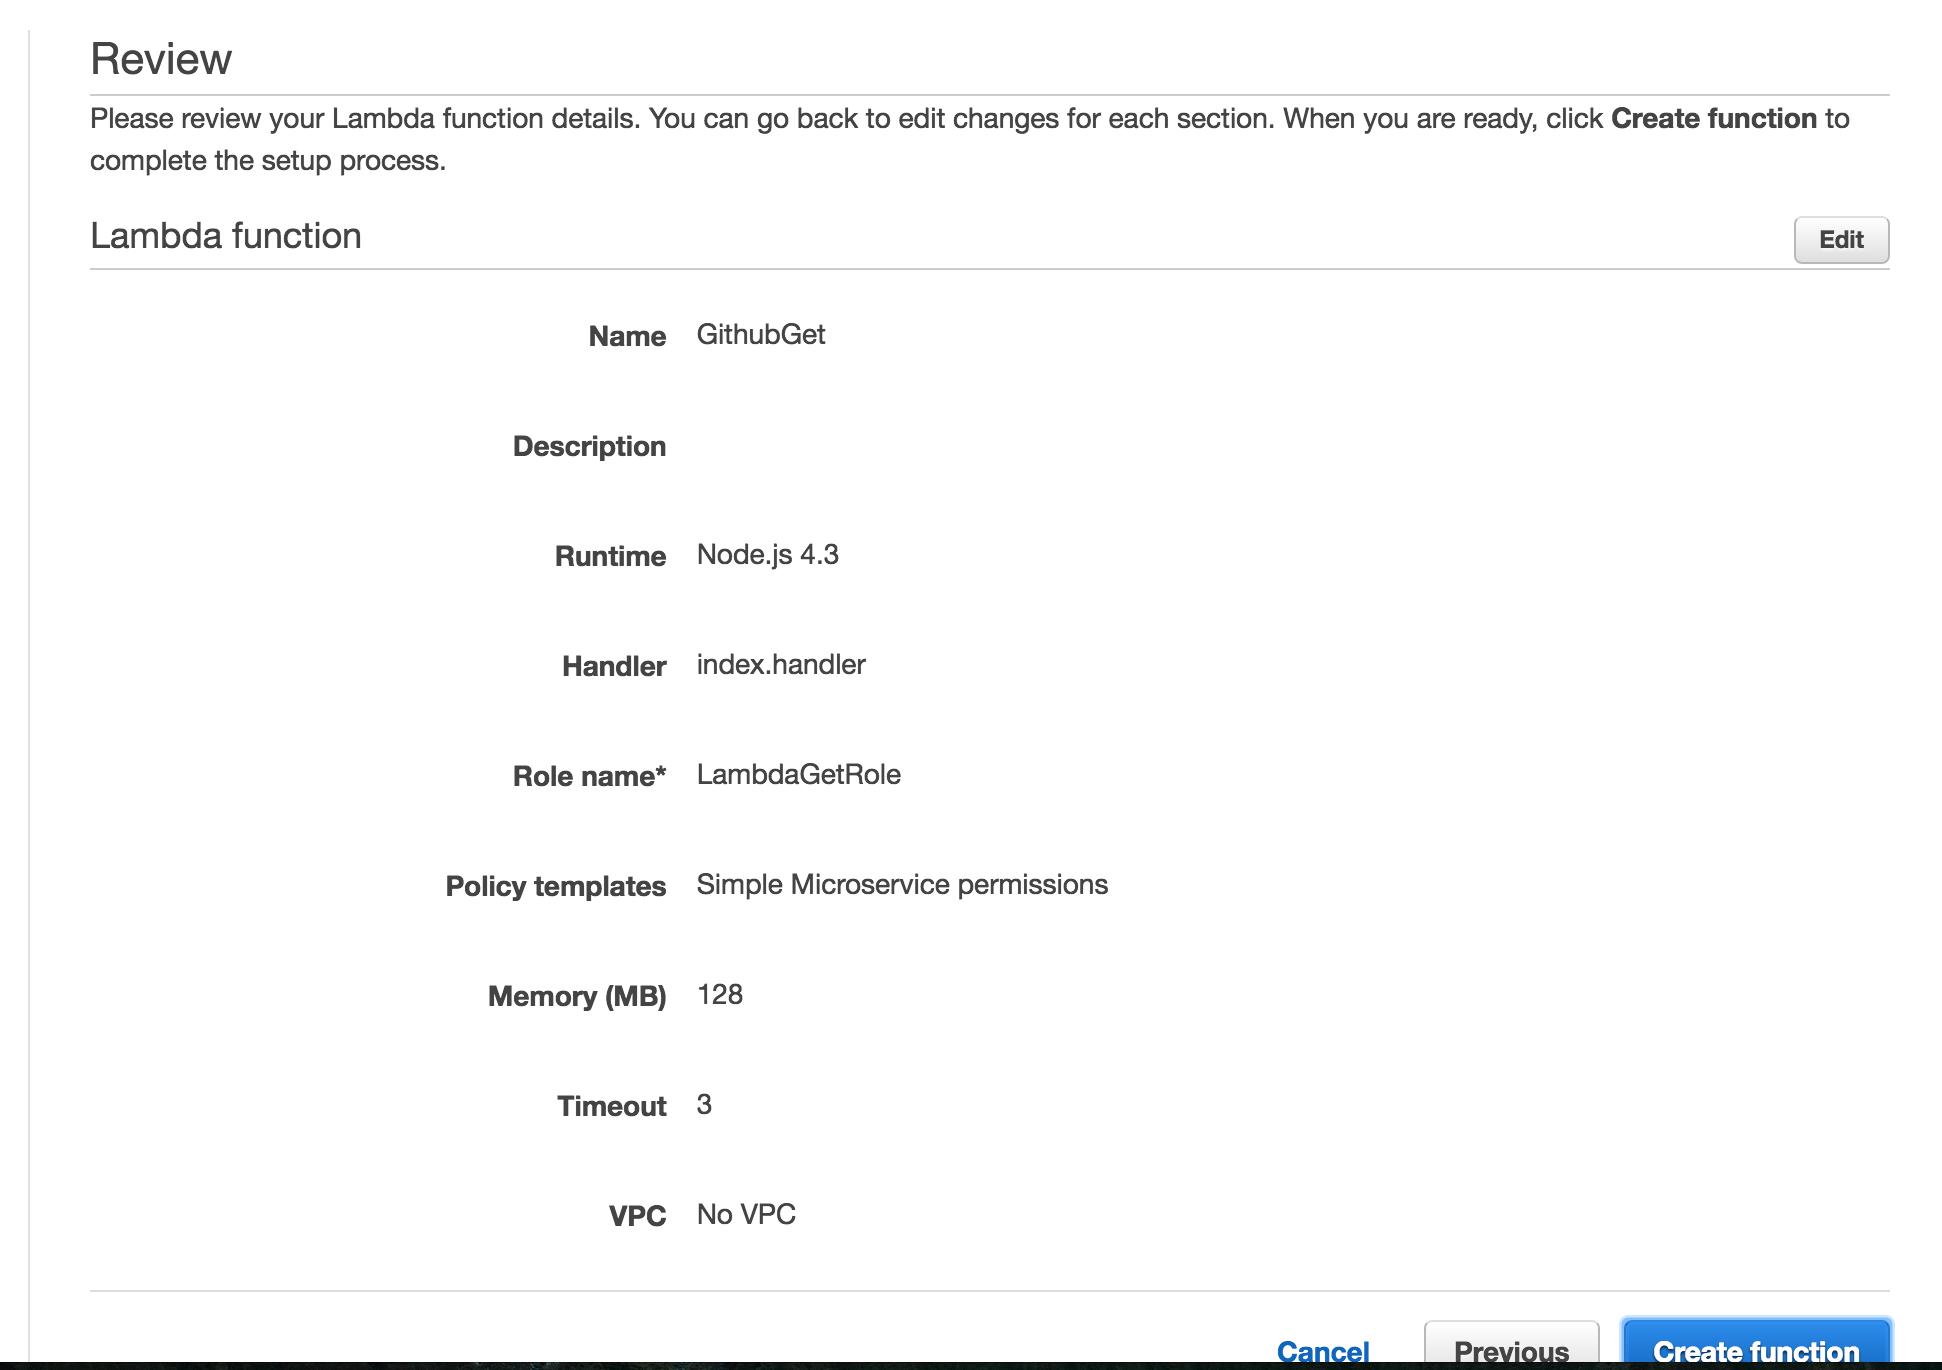 Review screen summarizing the chosen options